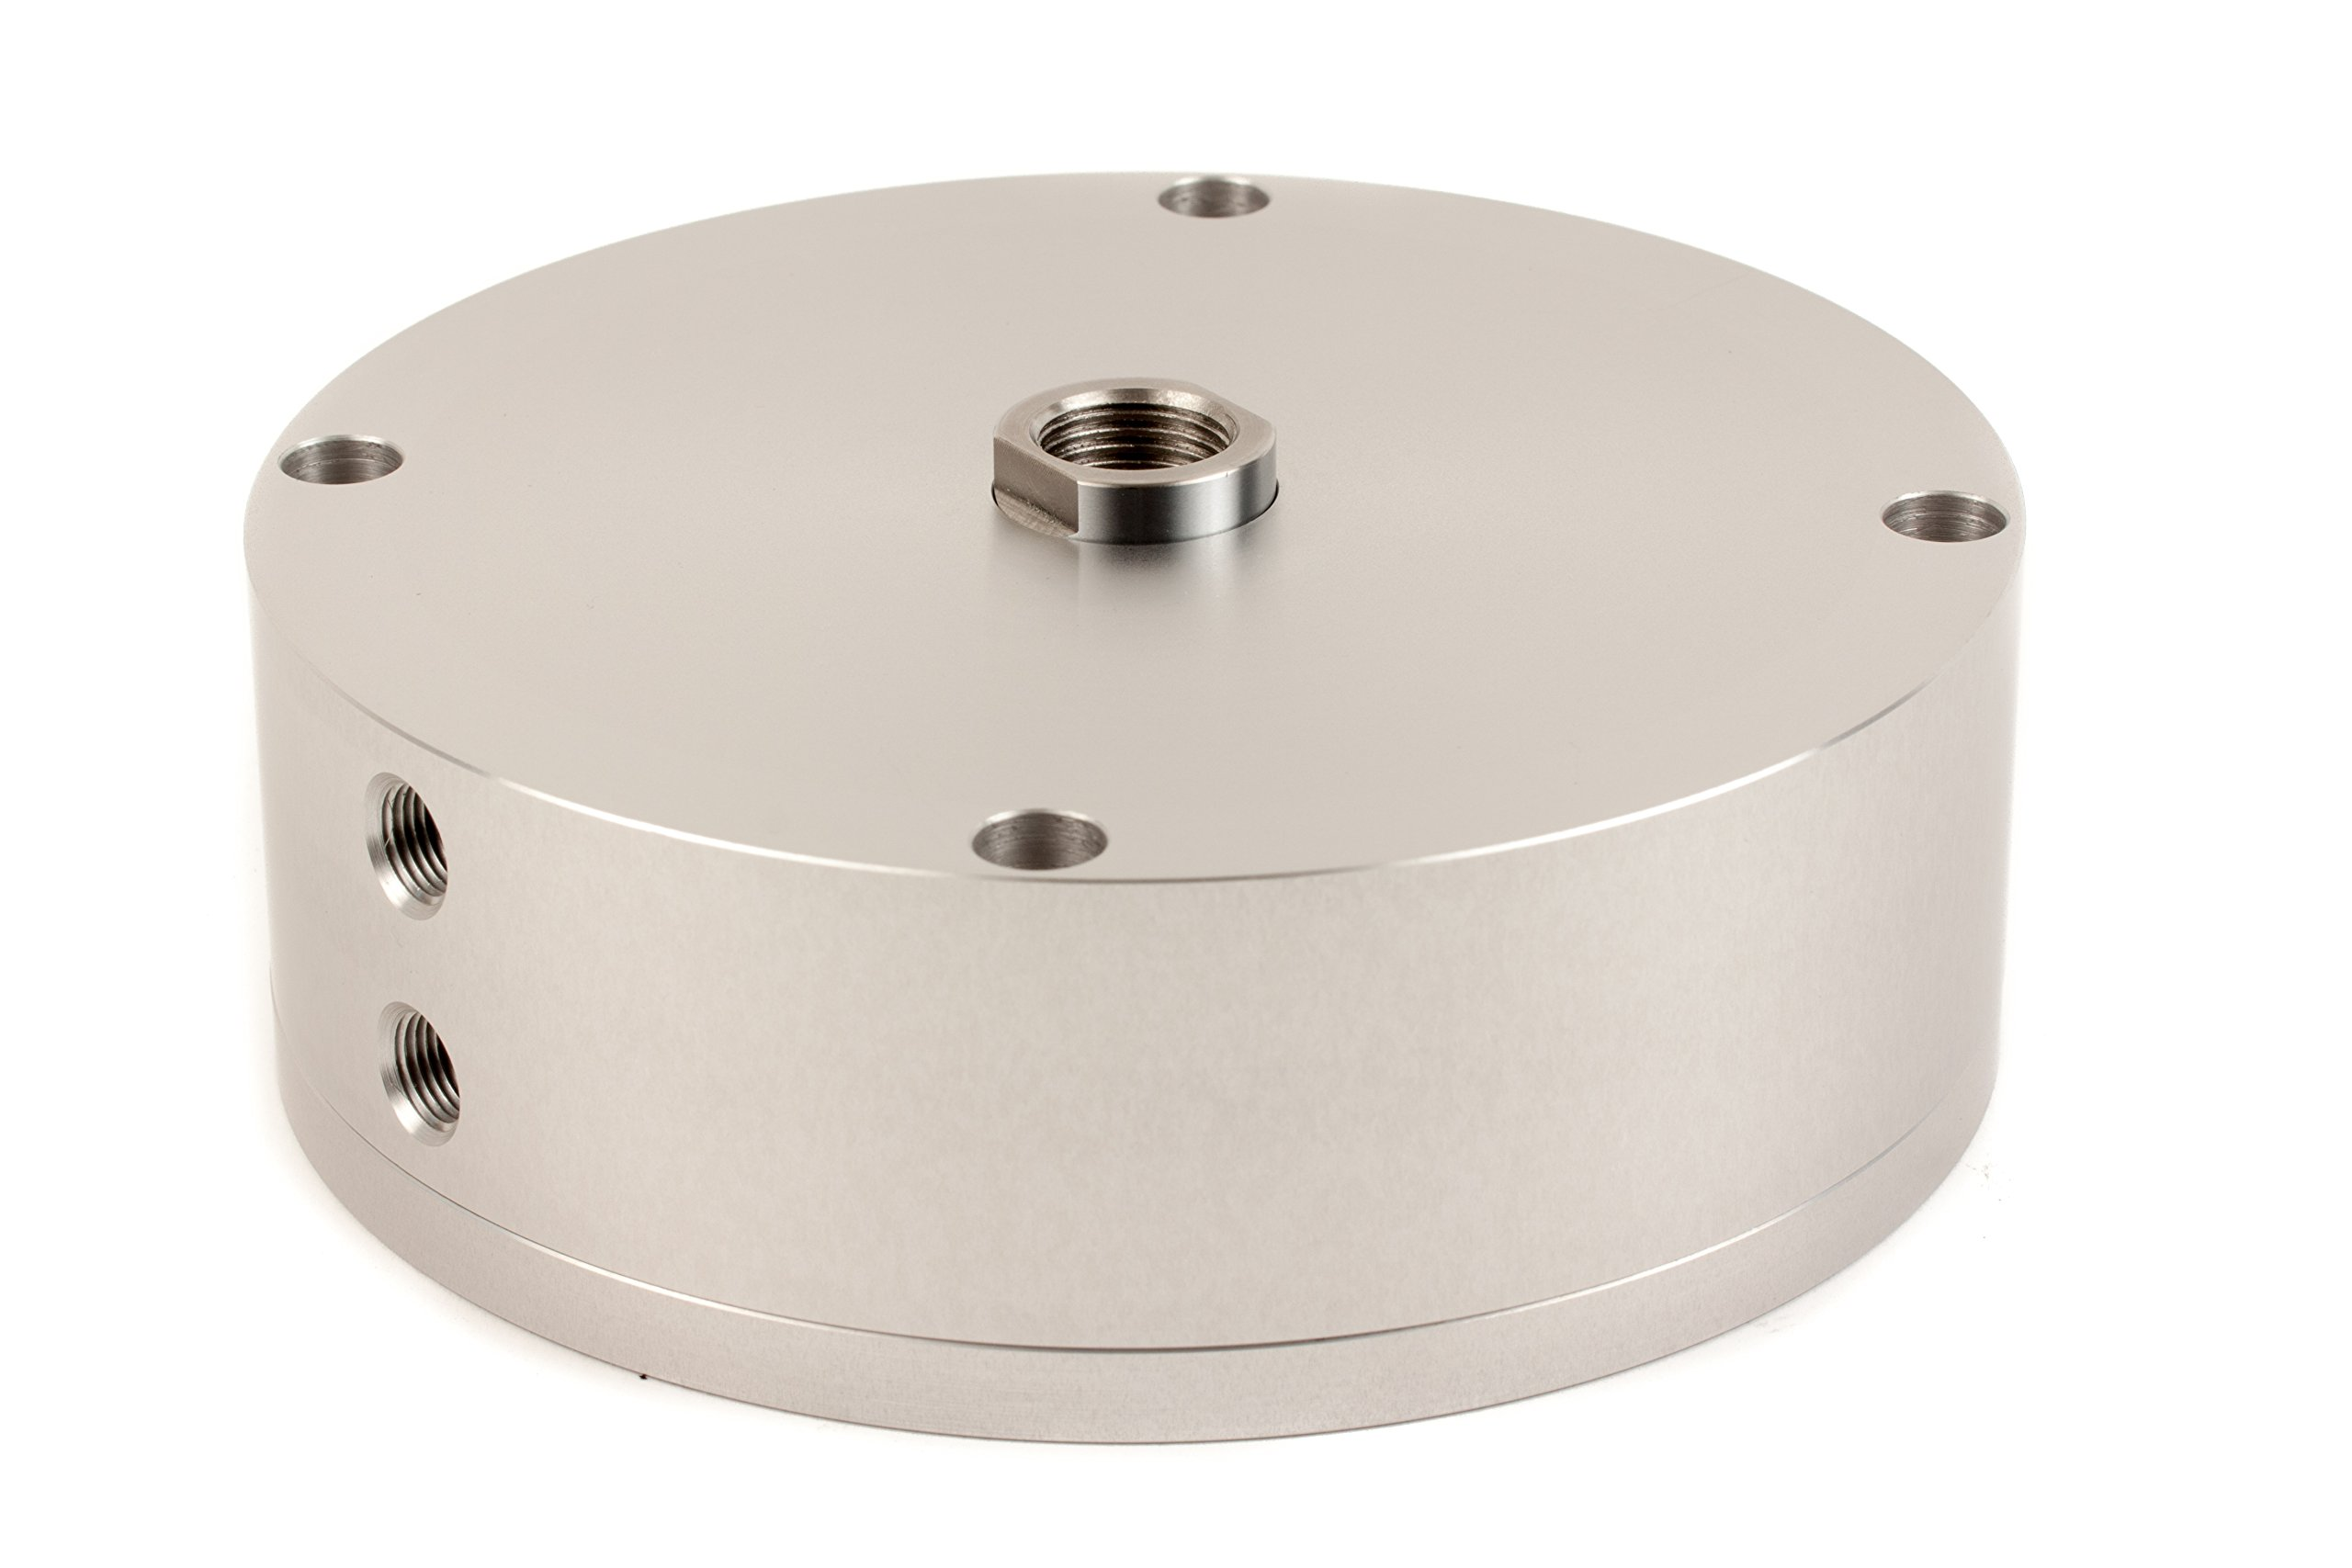 Fabco-Air AB-1221-X Original Pancake Cylinder, Double Acting, Maximum Pressure of 250 PSI, 4'' Bore Diameter x 1/4'' Stroke